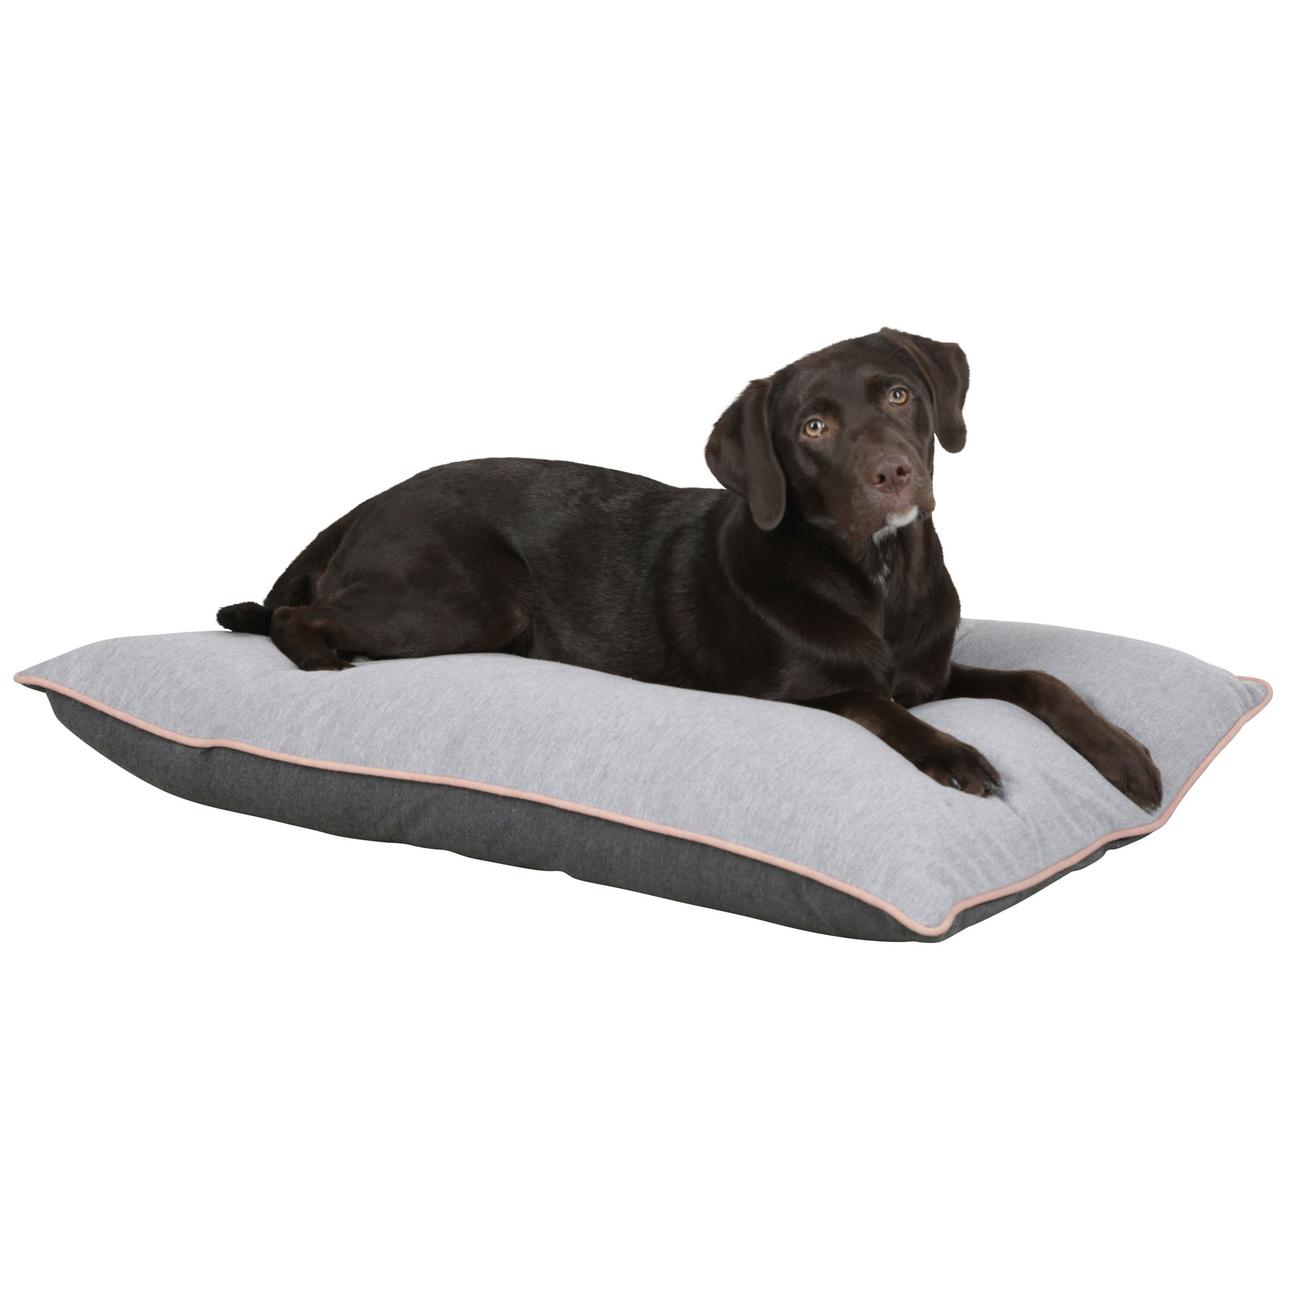 Kerbl Hunde - Liegekissen Kodiak, 90 x 70 x 12 cm